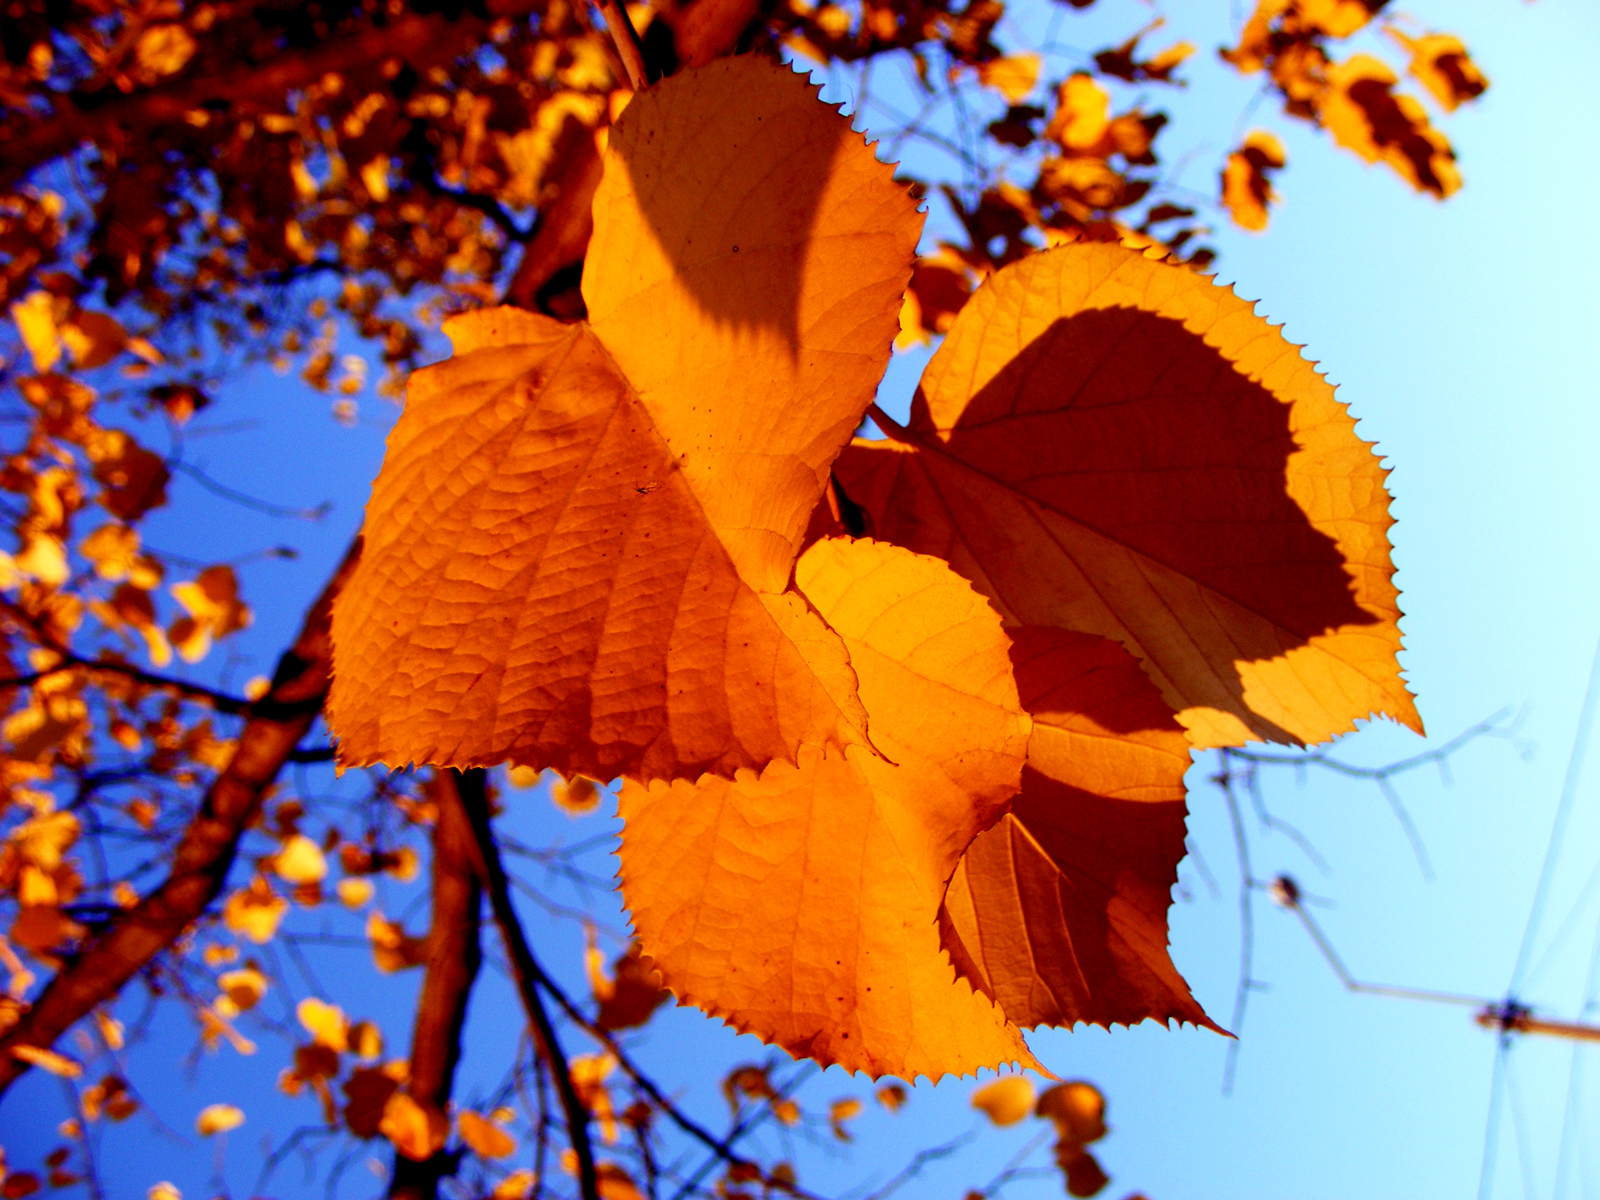 The best top autumn desktop wallpapers 9 En Güzel Sonbahar HD Duvar Kağıtları